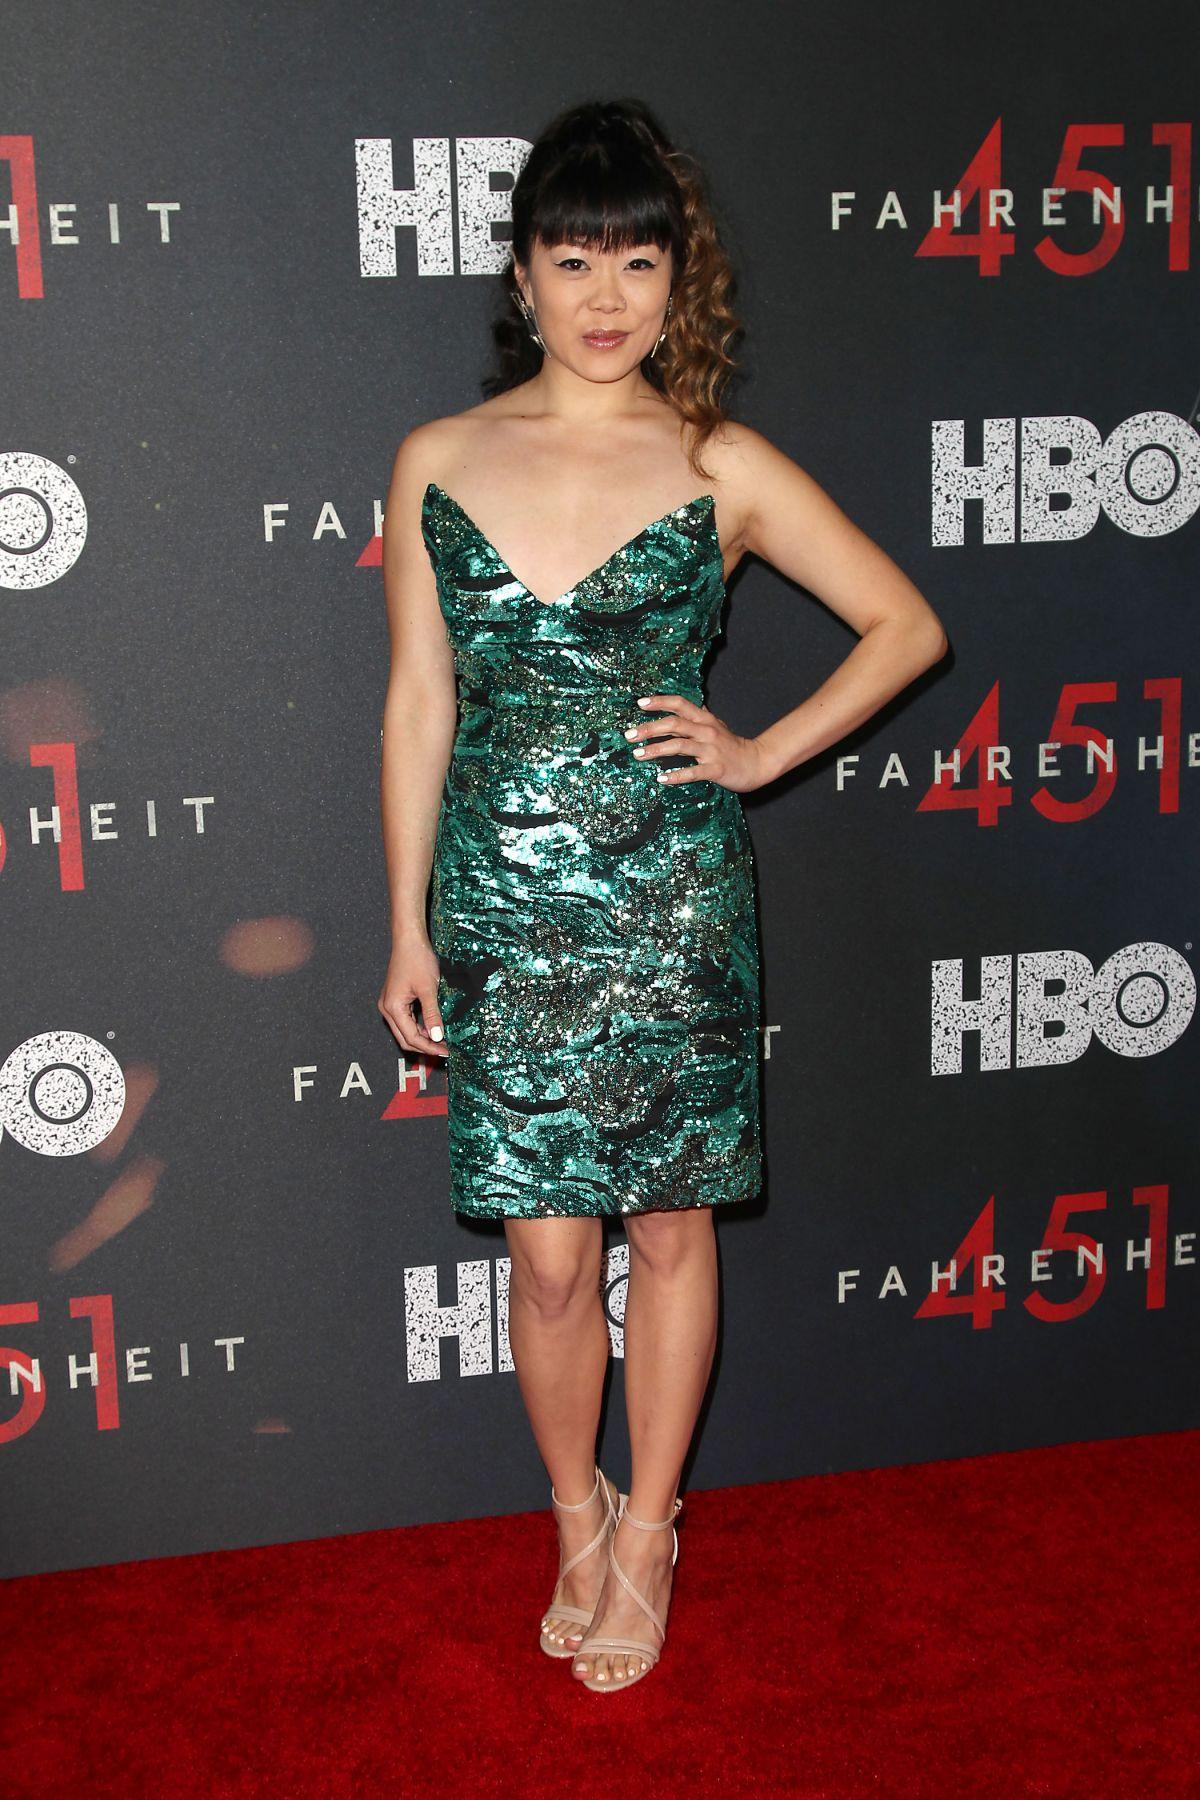 Kara Young - Fahrenheit 451 Premiere in NYC • CelebMafia